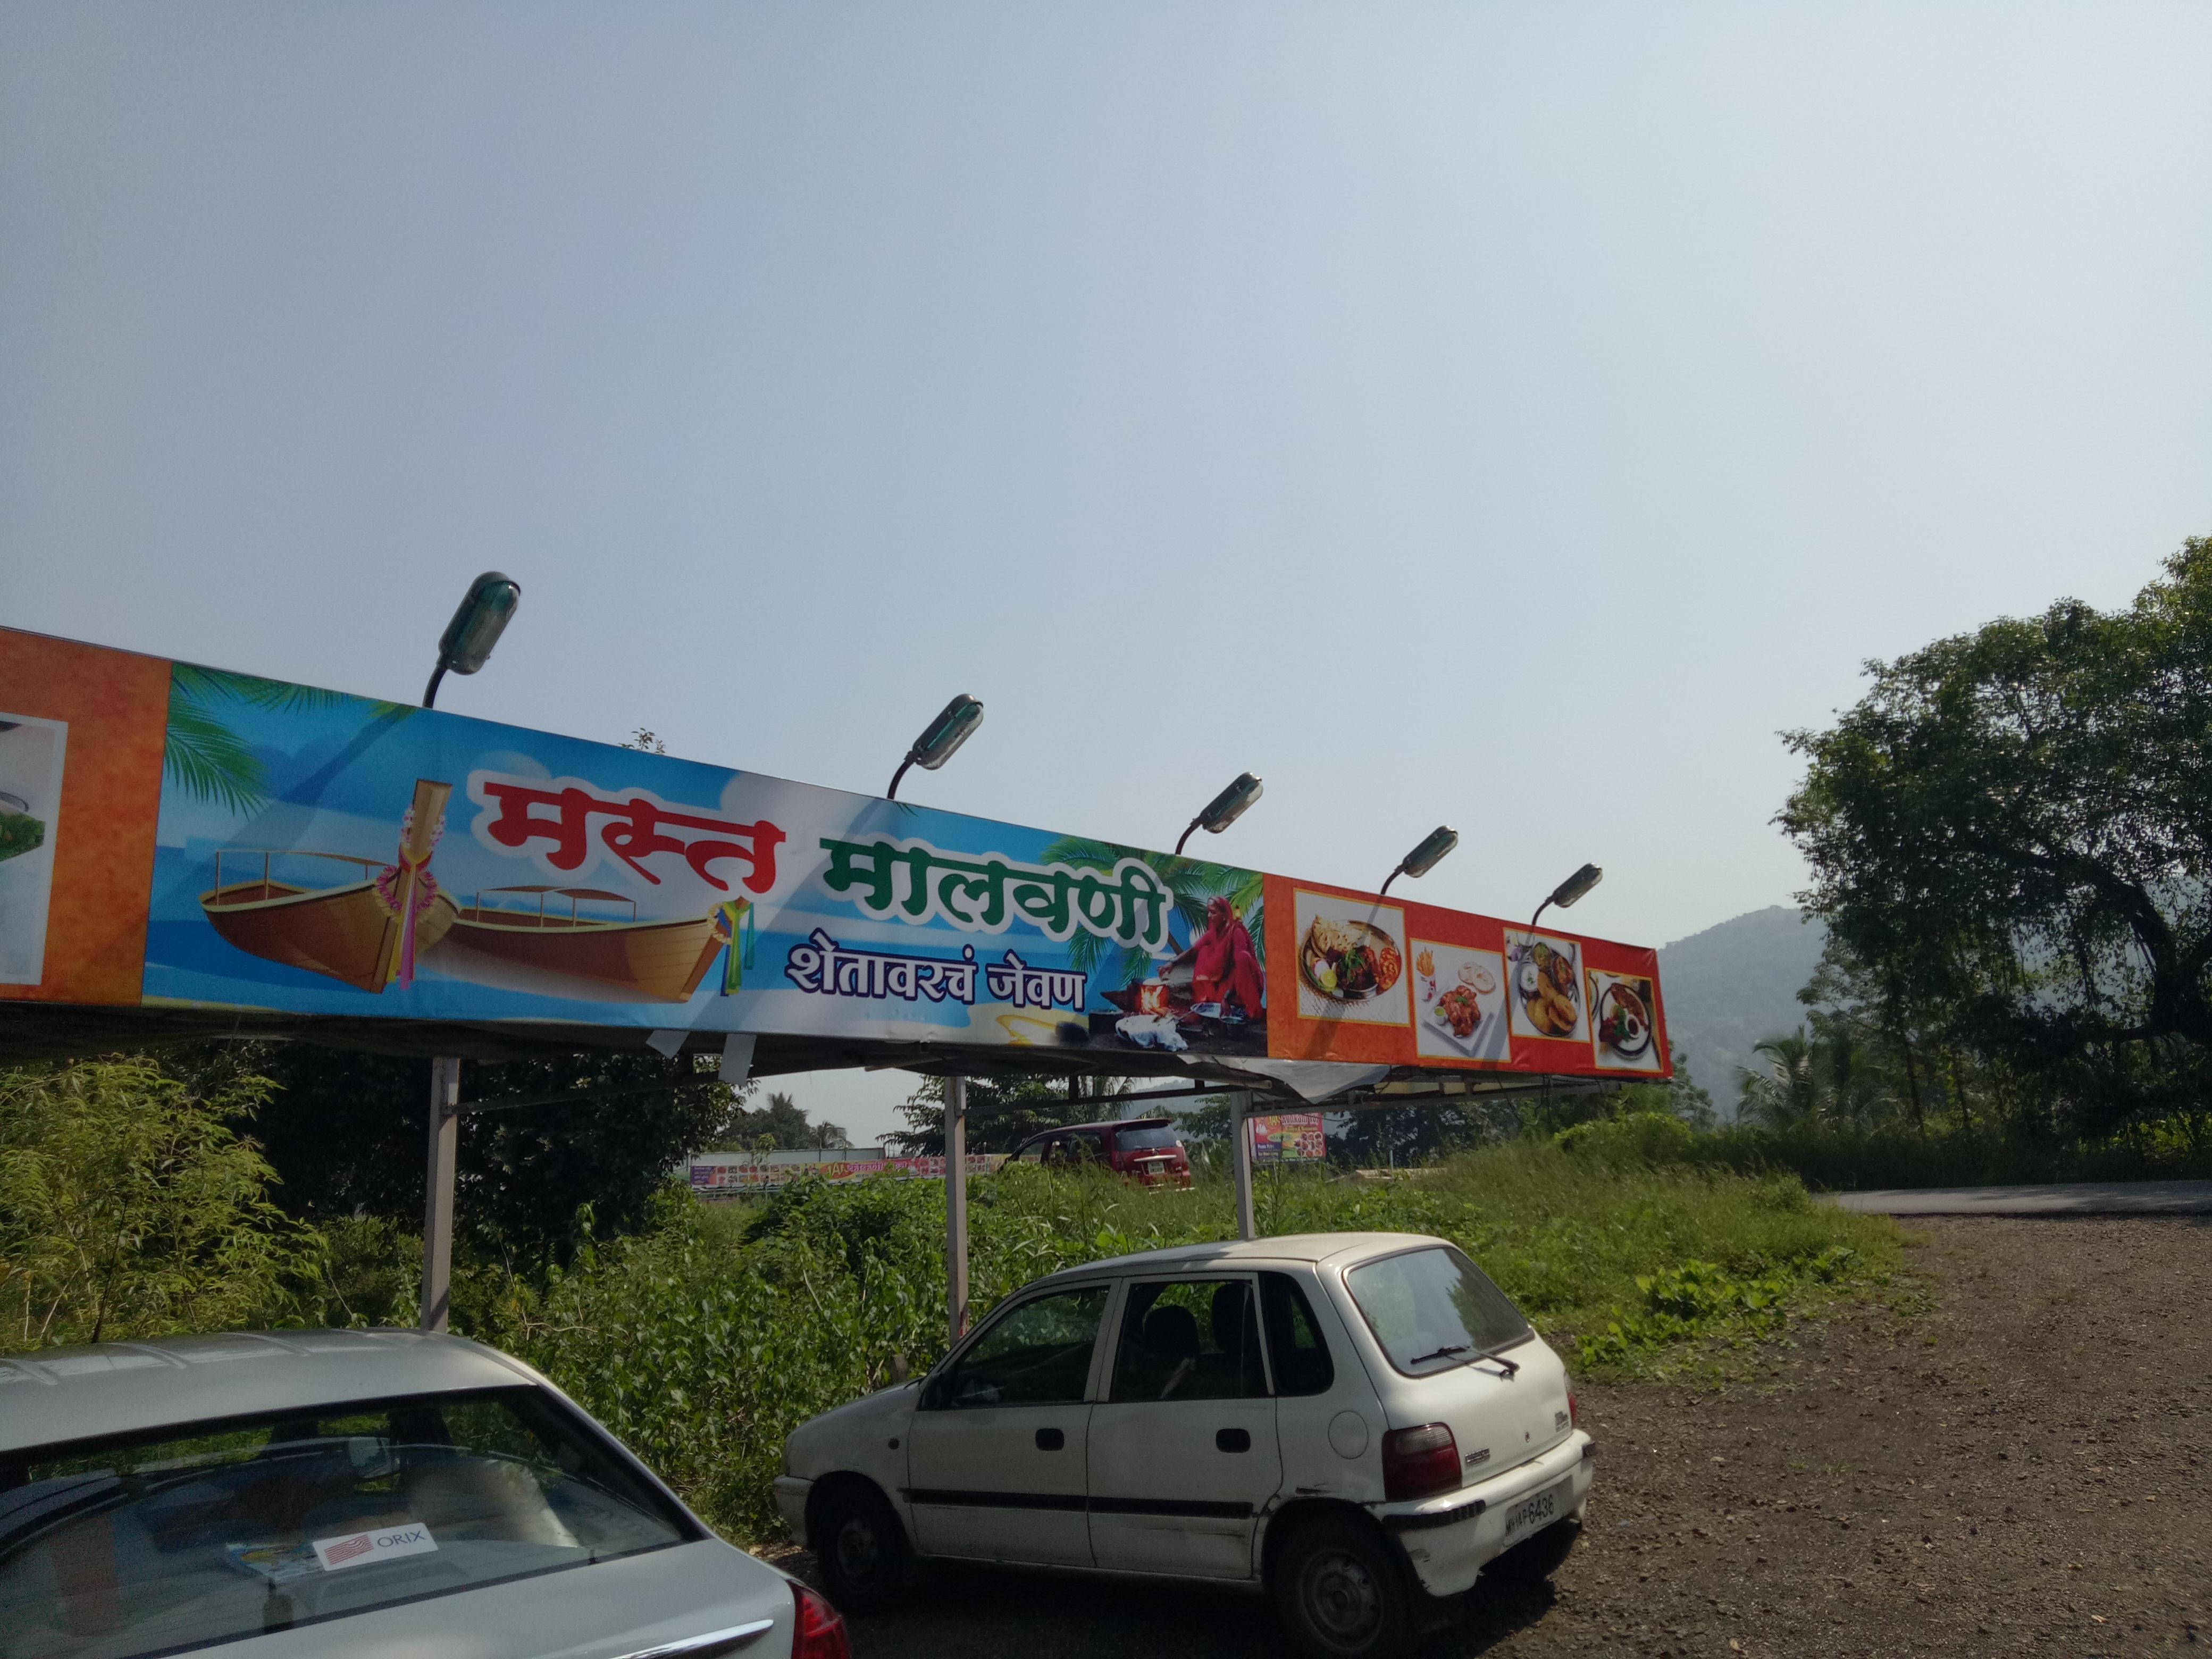 Restaurant enroute Pune to Ratnagiri